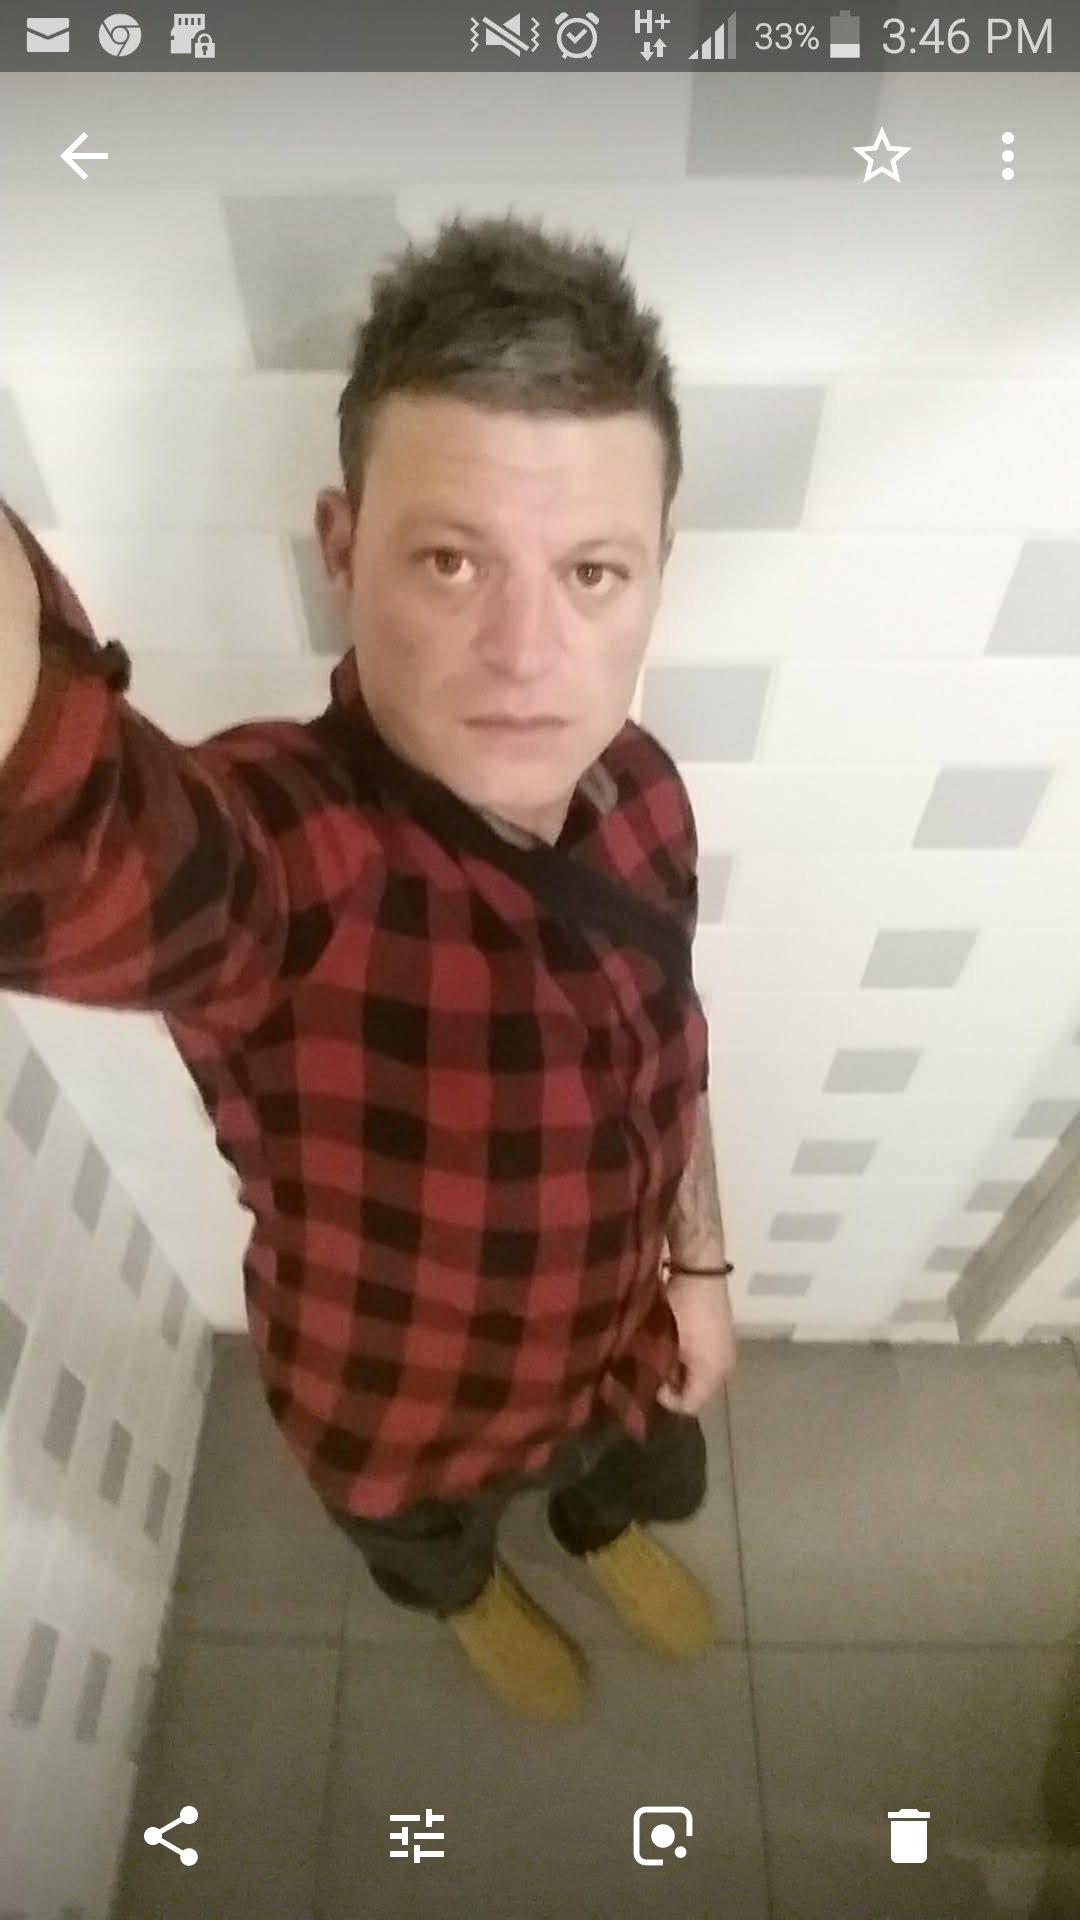 Georgieboy from Victoria,Australia